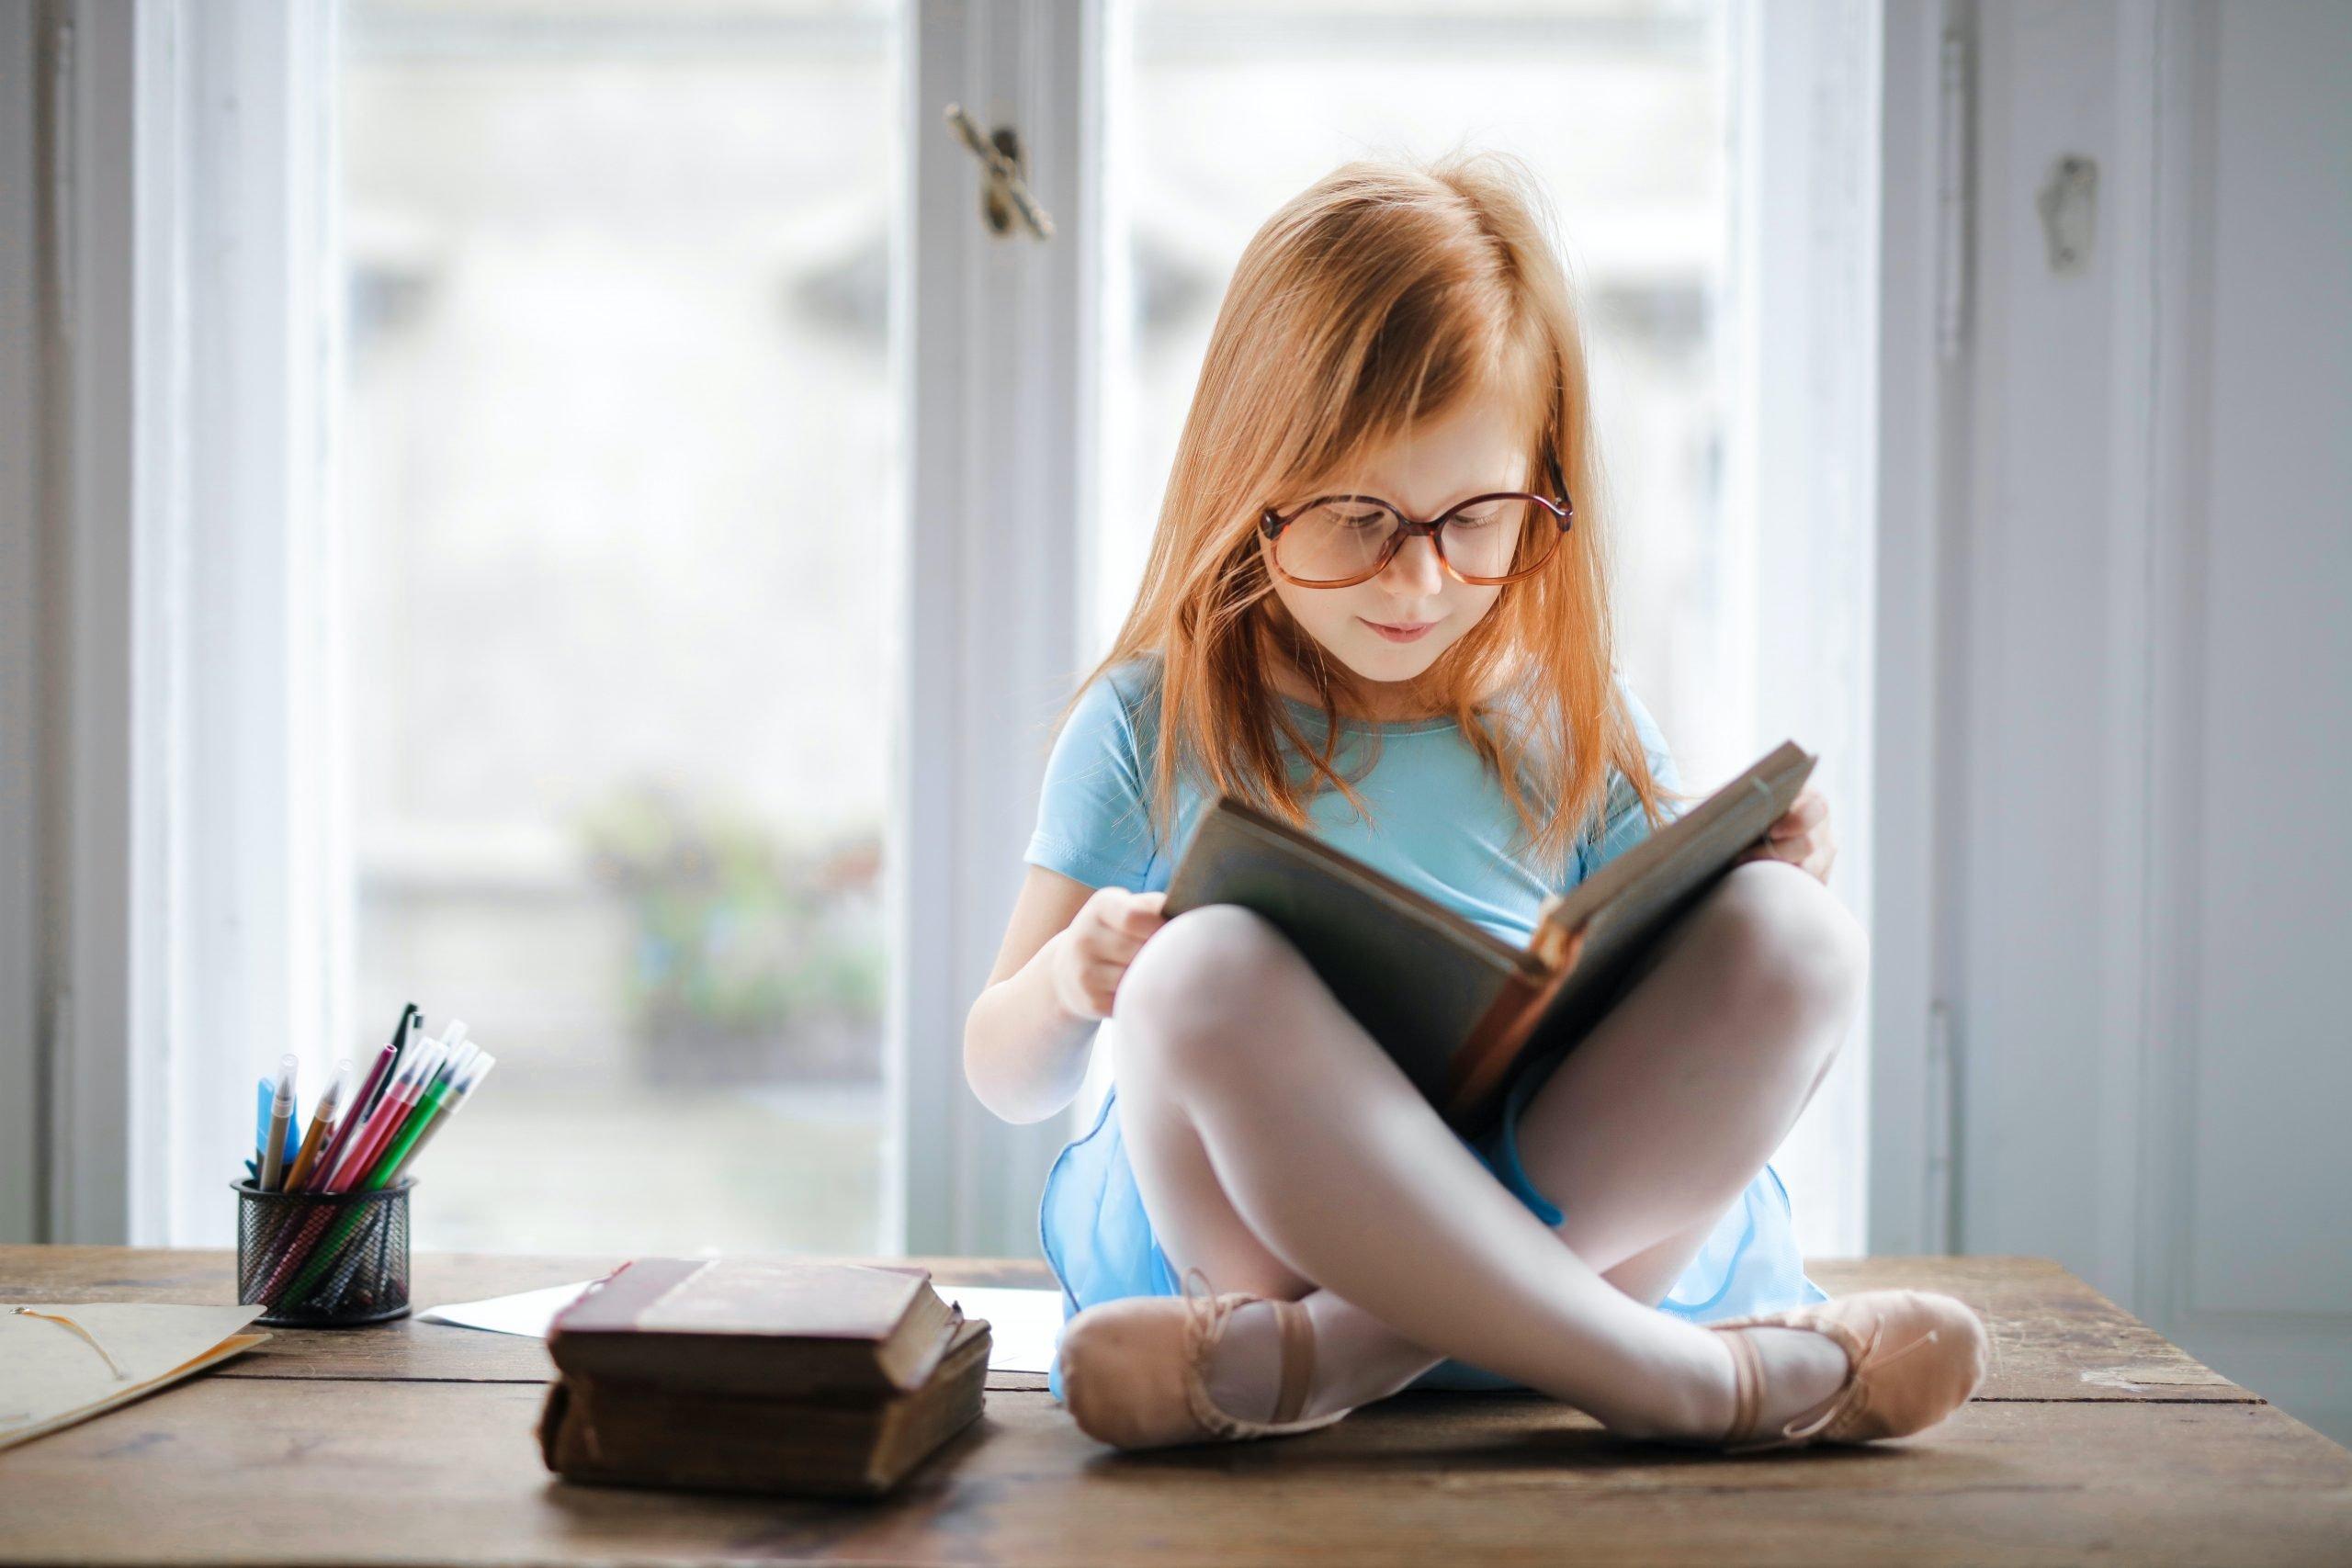 Children's Books that teach kindness